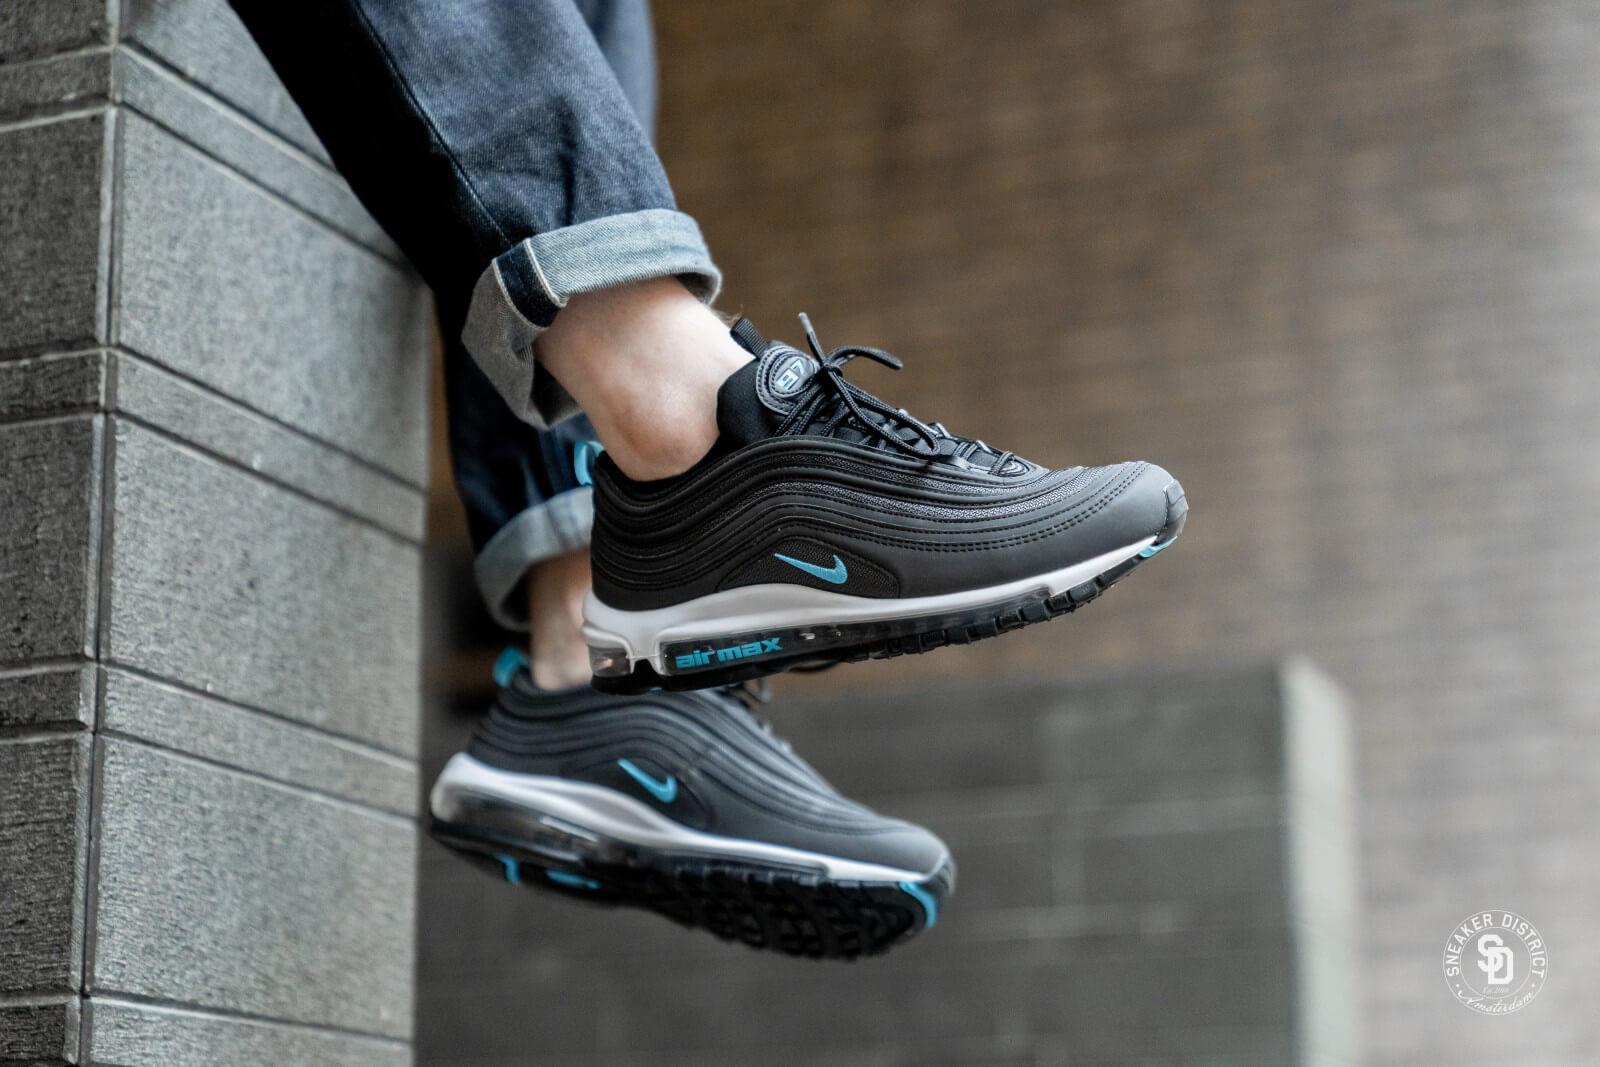 Nike Air Max 97 Black Blue Fury Dark Grey Bv1985 001